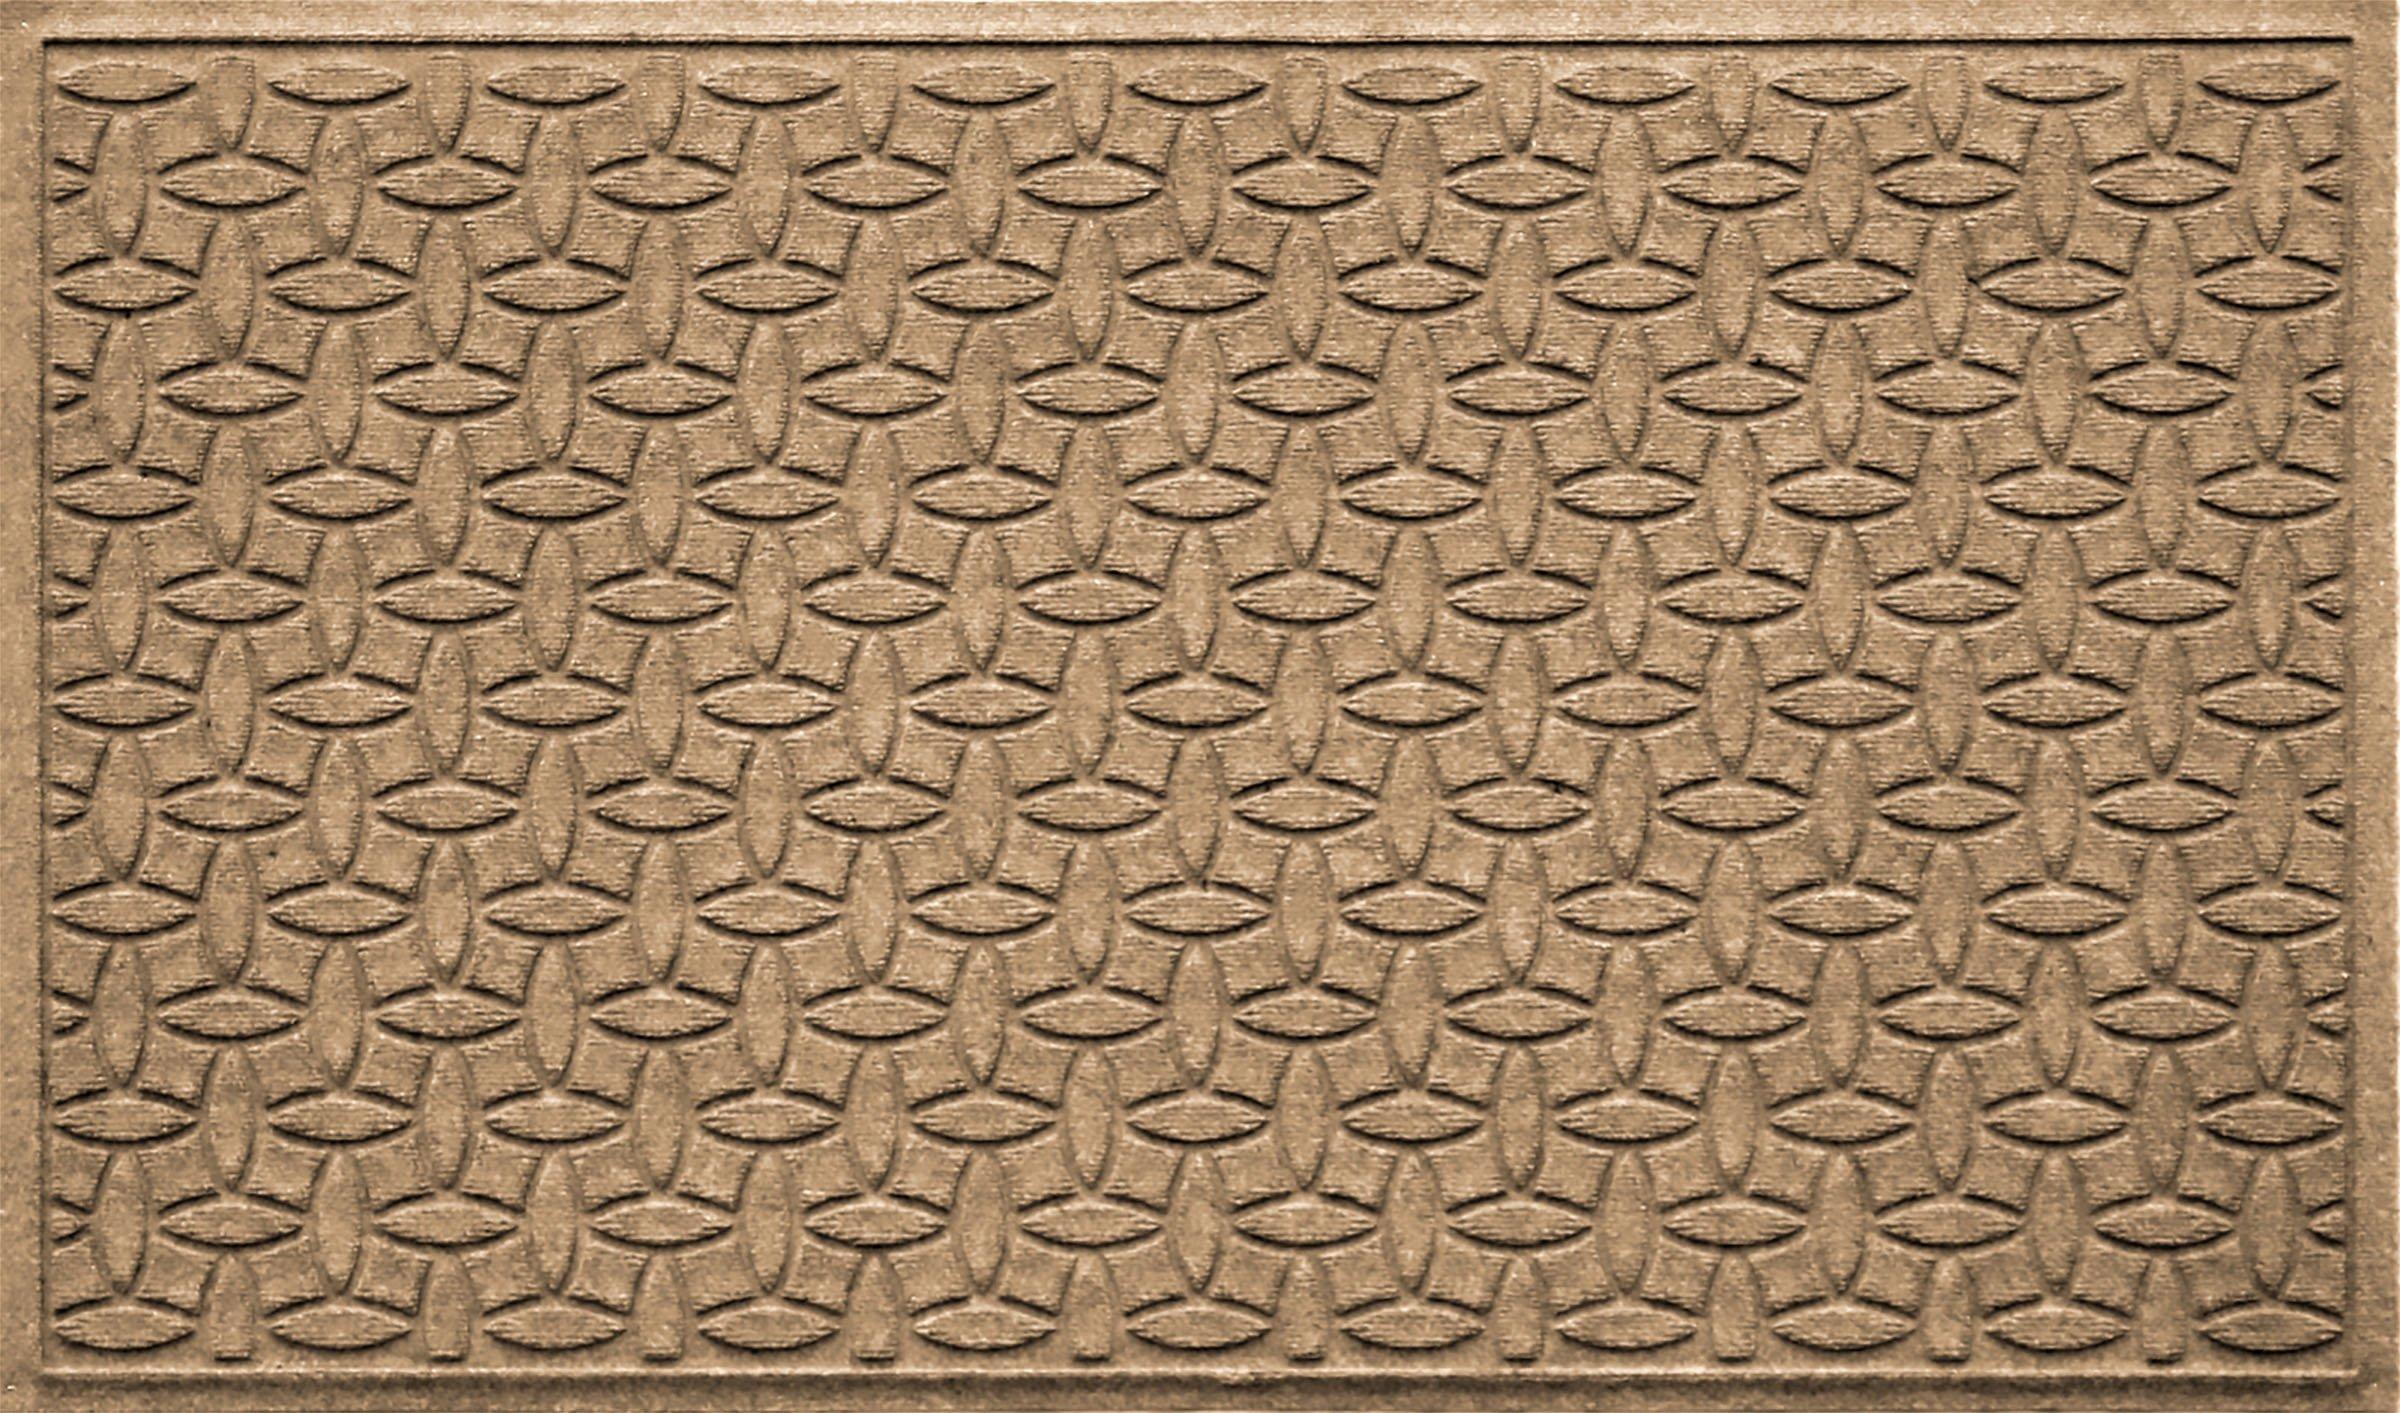 Bungalow Flooring Waterhog Doormat, 3' x 5', Skid Resistant, Easy to Clean, Catches Water and Debris, Ellipse Collection, Khaki